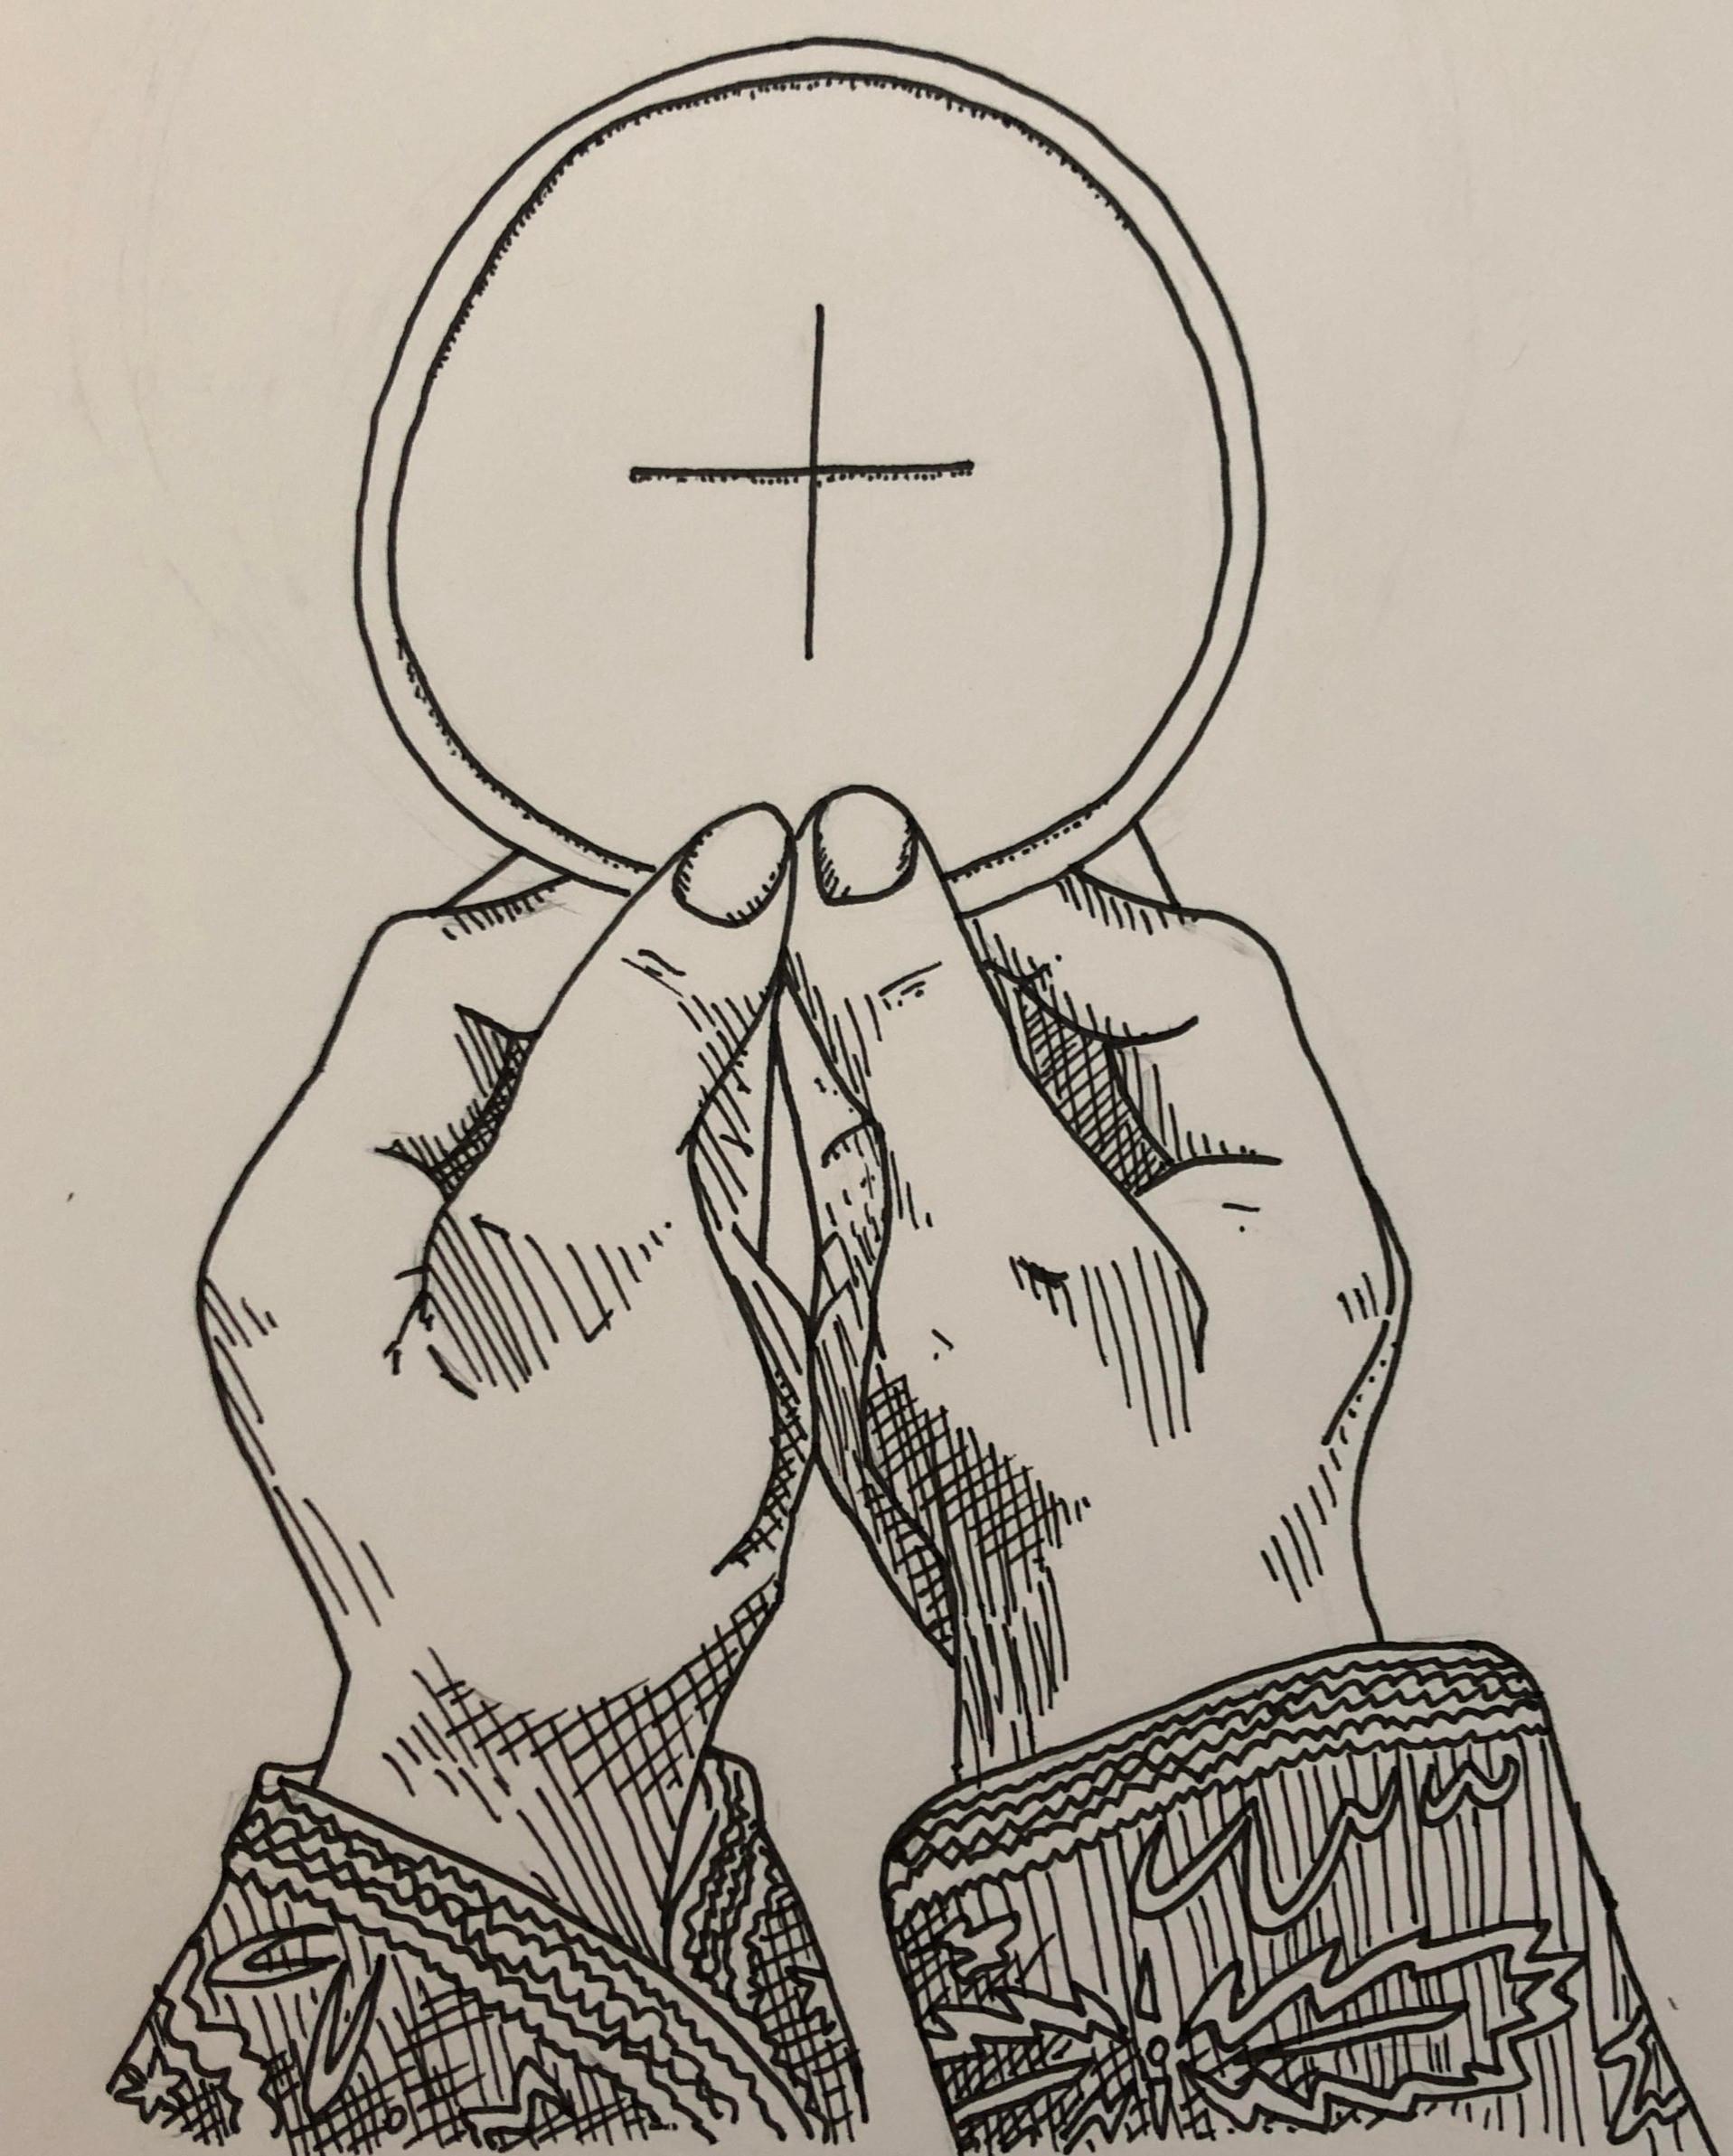 Daily Mass Intention